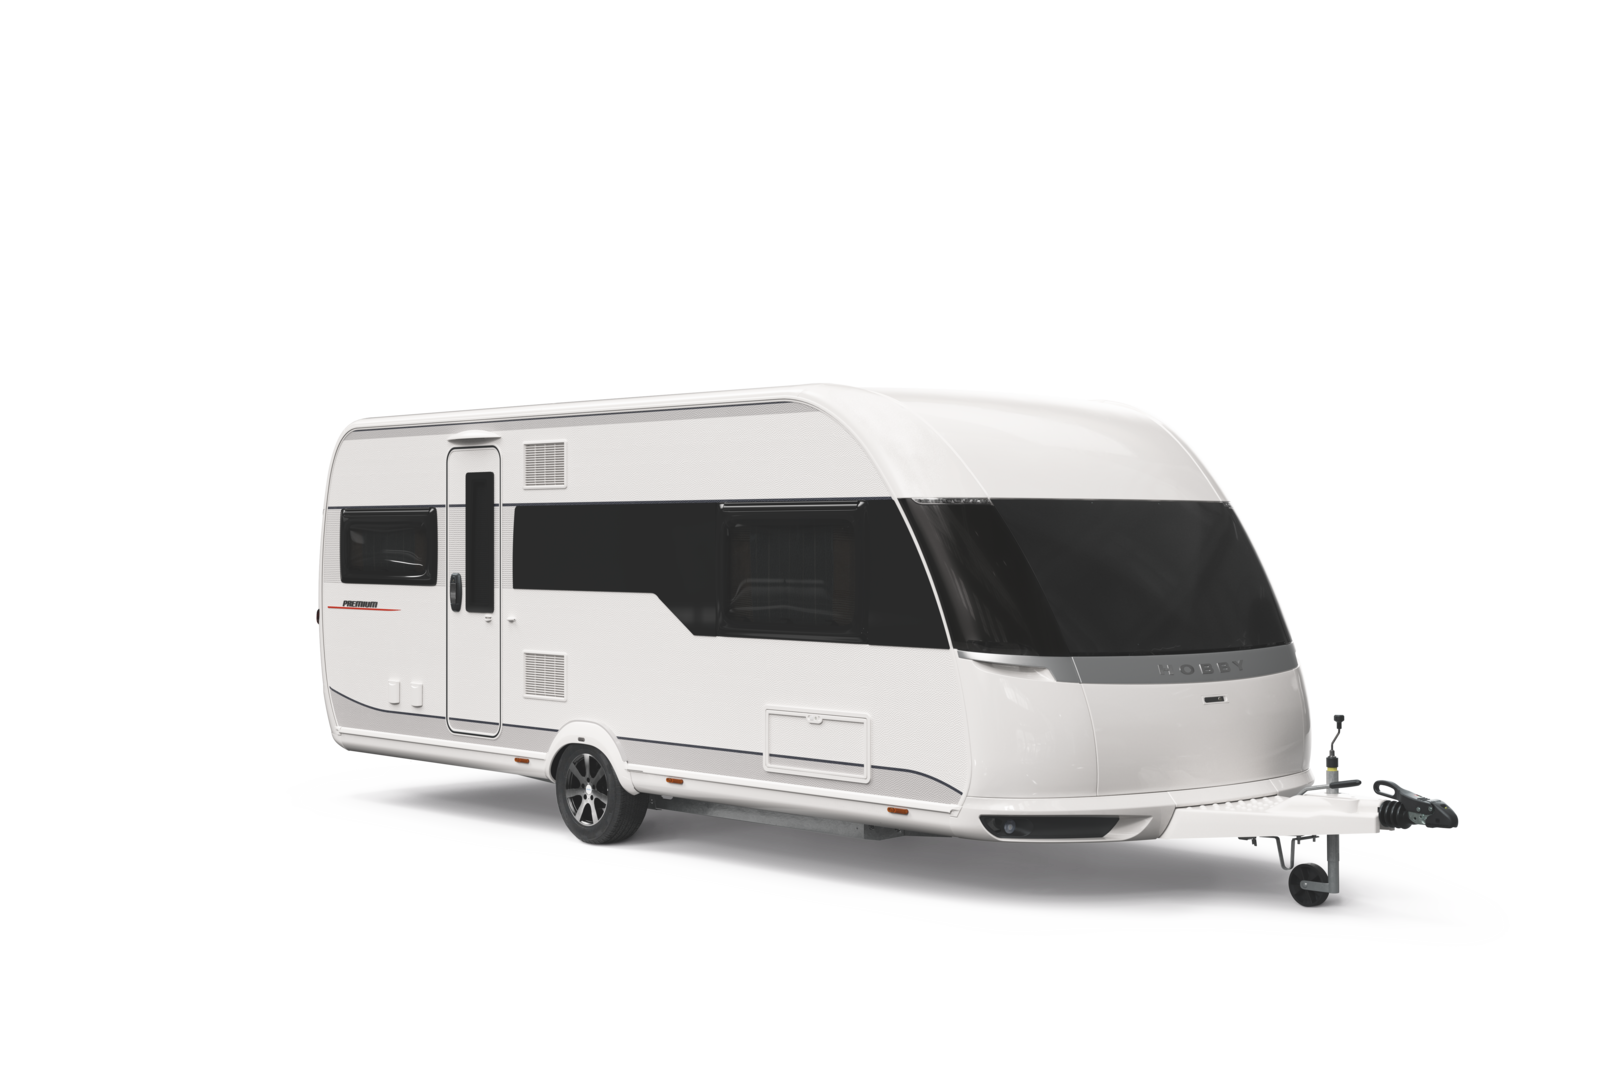 premium hobby caravan. Black Bedroom Furniture Sets. Home Design Ideas